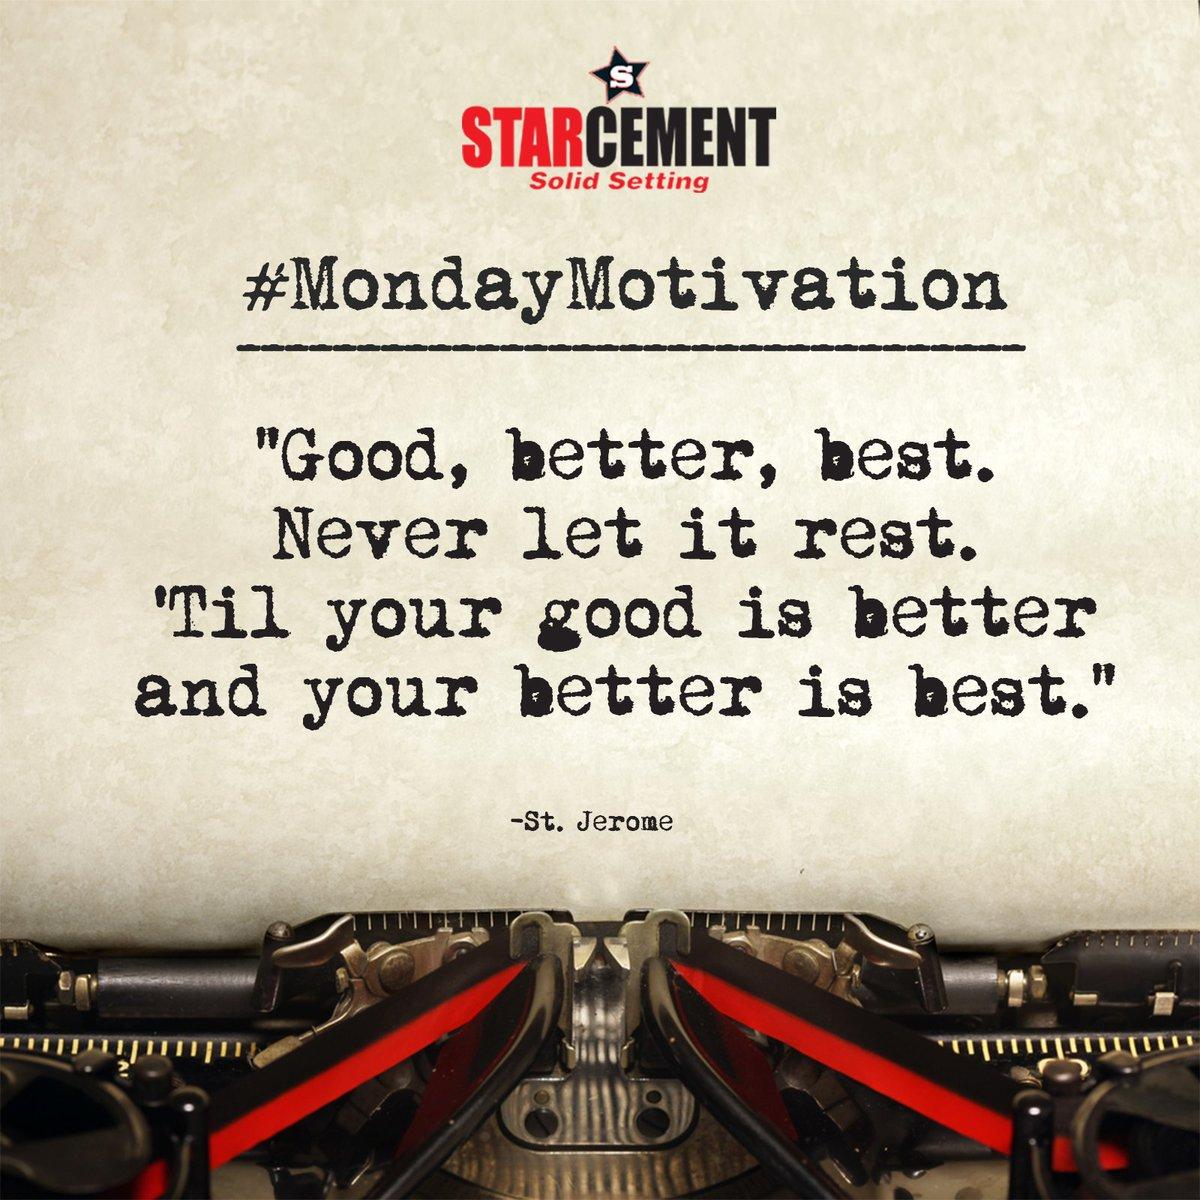 Turn your better to best.  #MondayMotivation #QuoteofTheDay #MotivationalQuote #Motivation #StarCement<br>http://pic.twitter.com/OPJFMppMNI